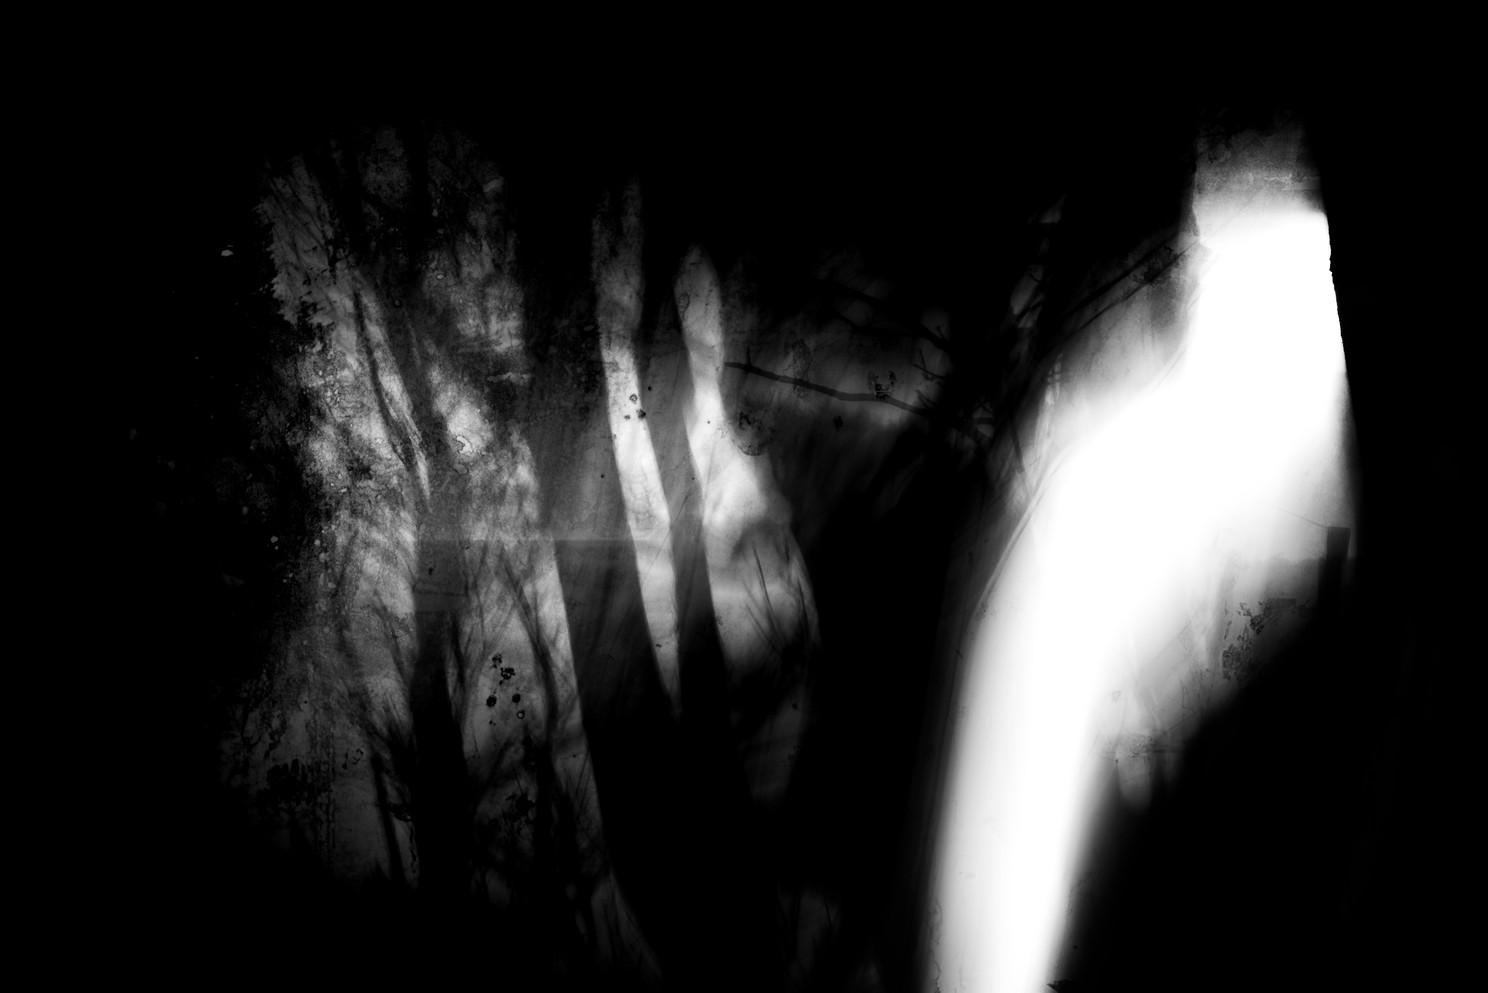 Creep (Copse) 026